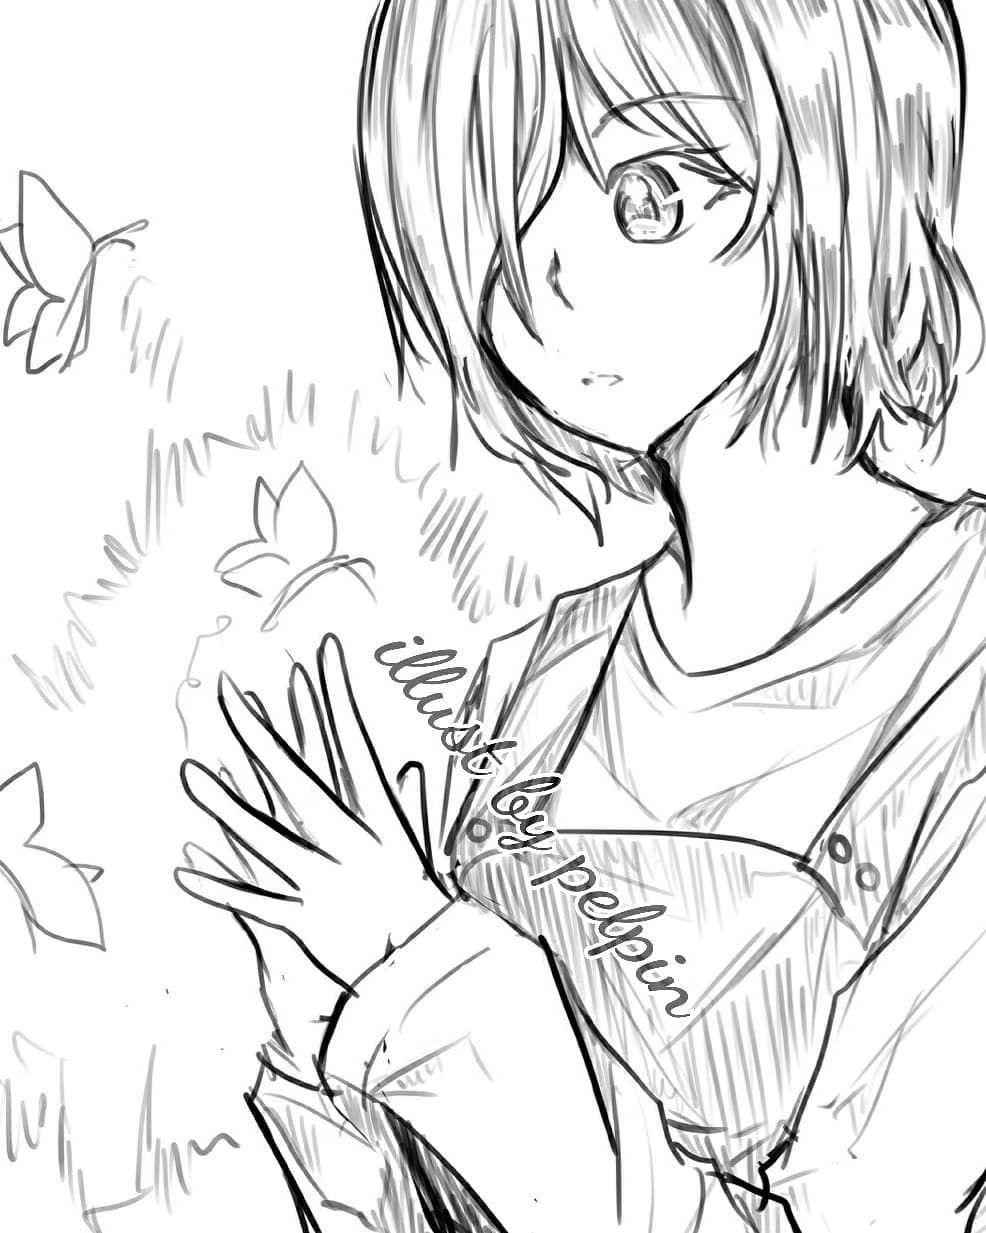 Digital Draw Touka Kirishima Tokyo Ghoul Touka Toukakirishima Tokyoghoul Tokyoghoulre Kirishima Ghoul Digitalart Digitaldrawing Digitaldraw Manga